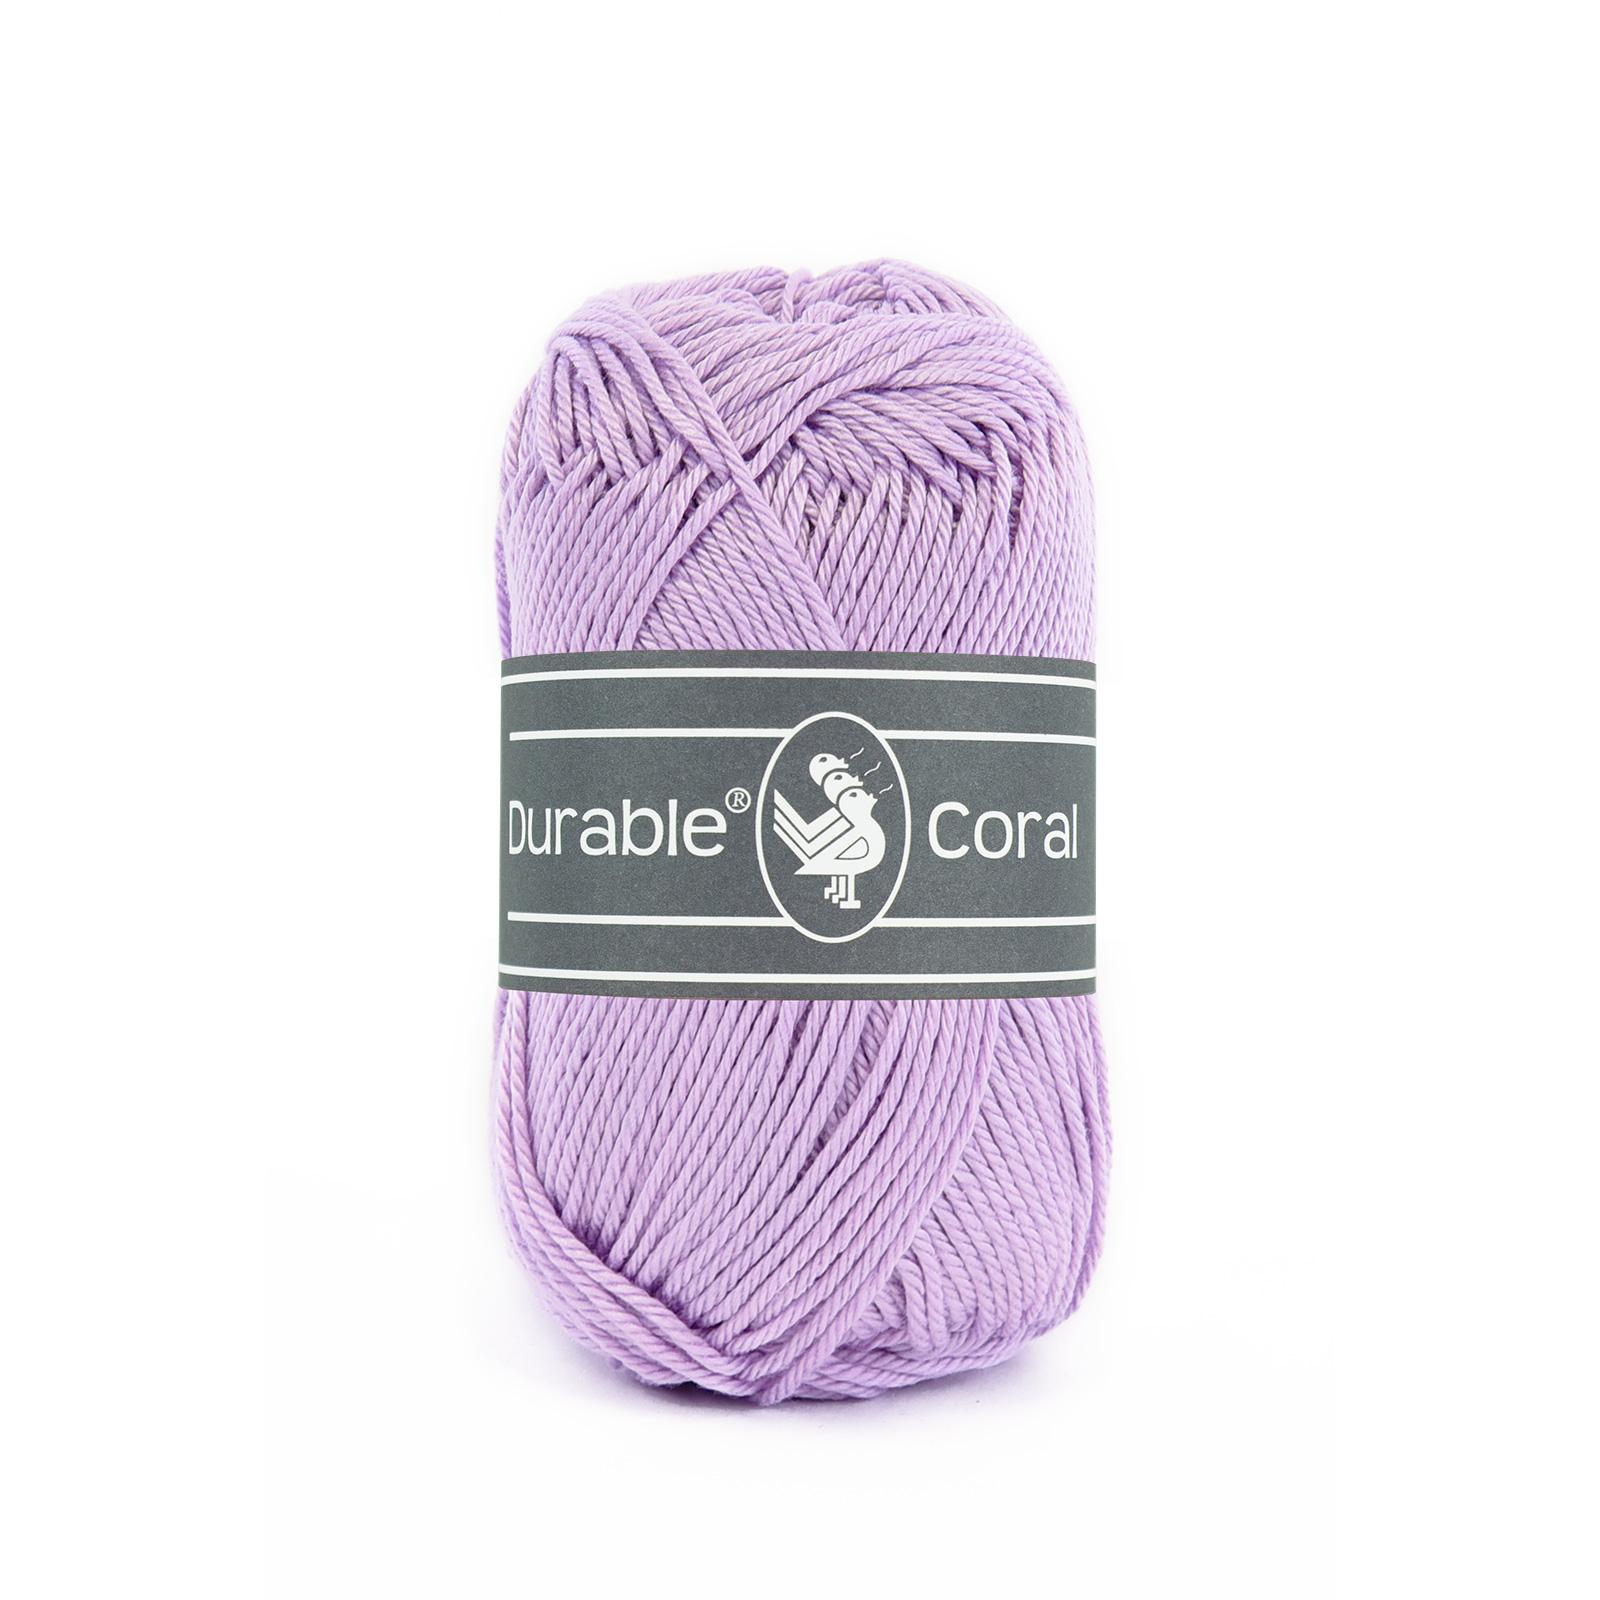 Durable Coral – 396 Lavender